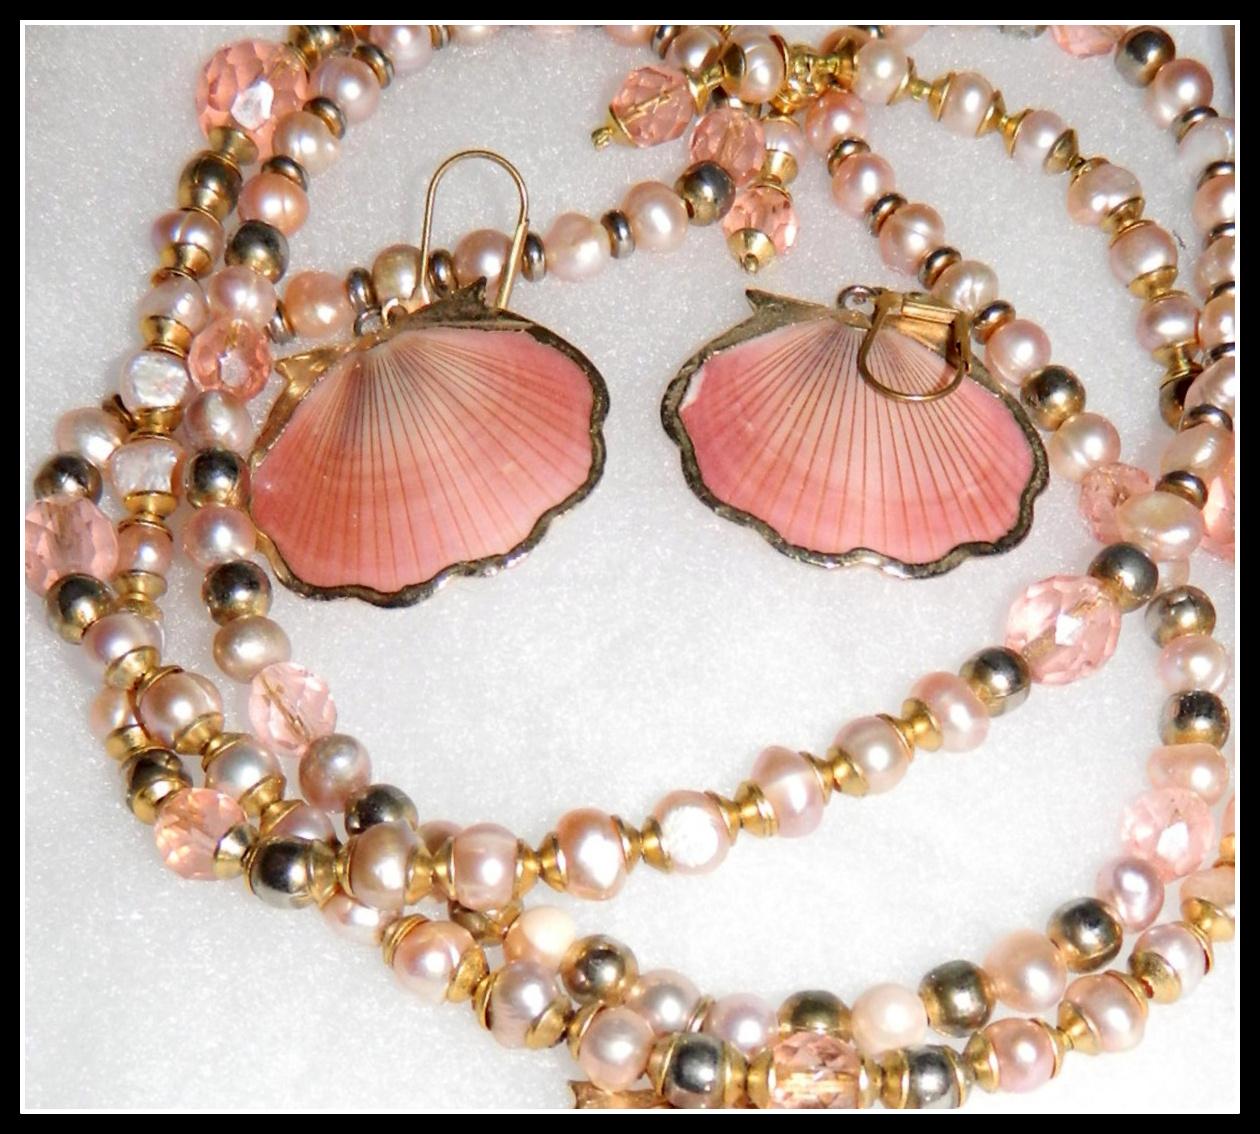 Seashells & Soft Pearls